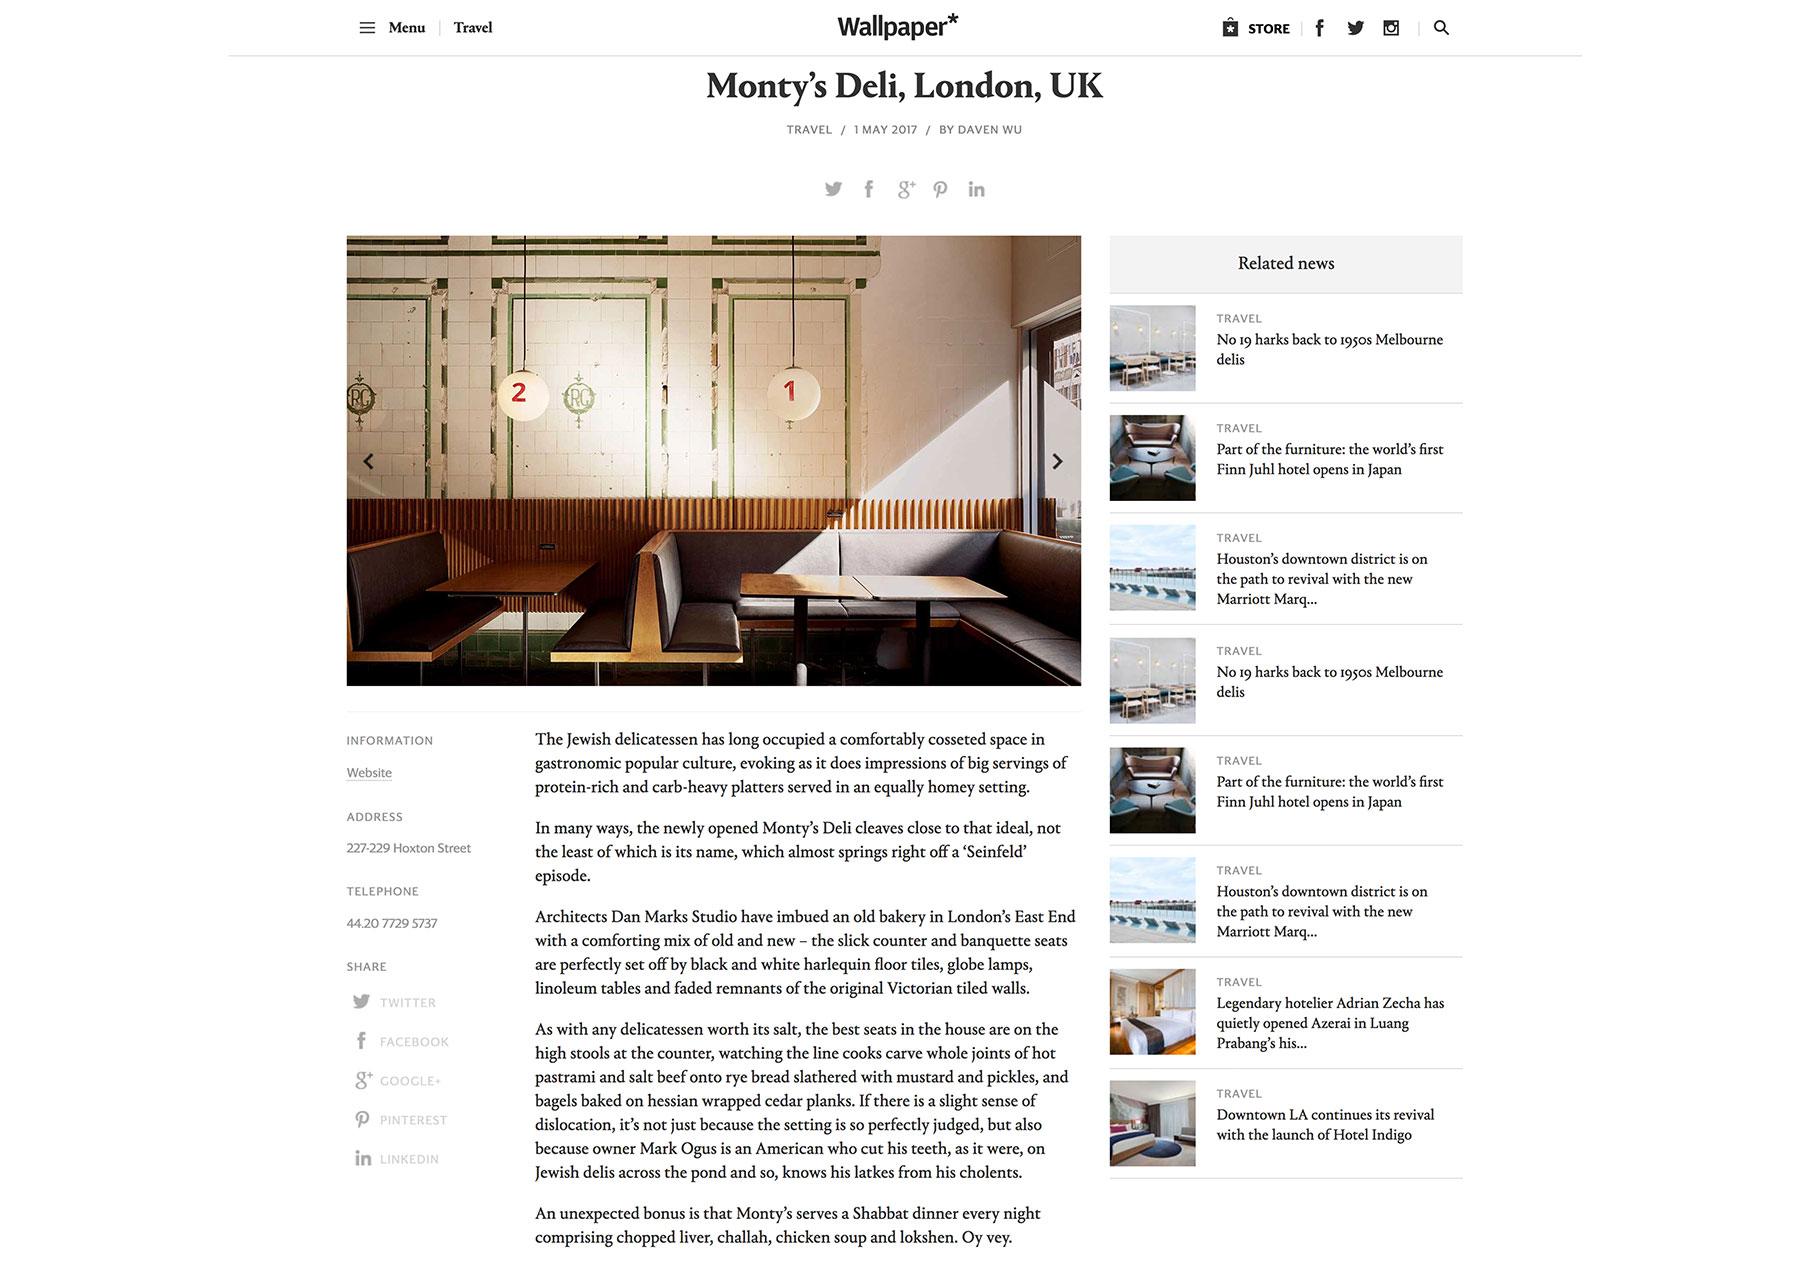 Montys-Deli-Wallpaper-Online-Feature_LR.jpg